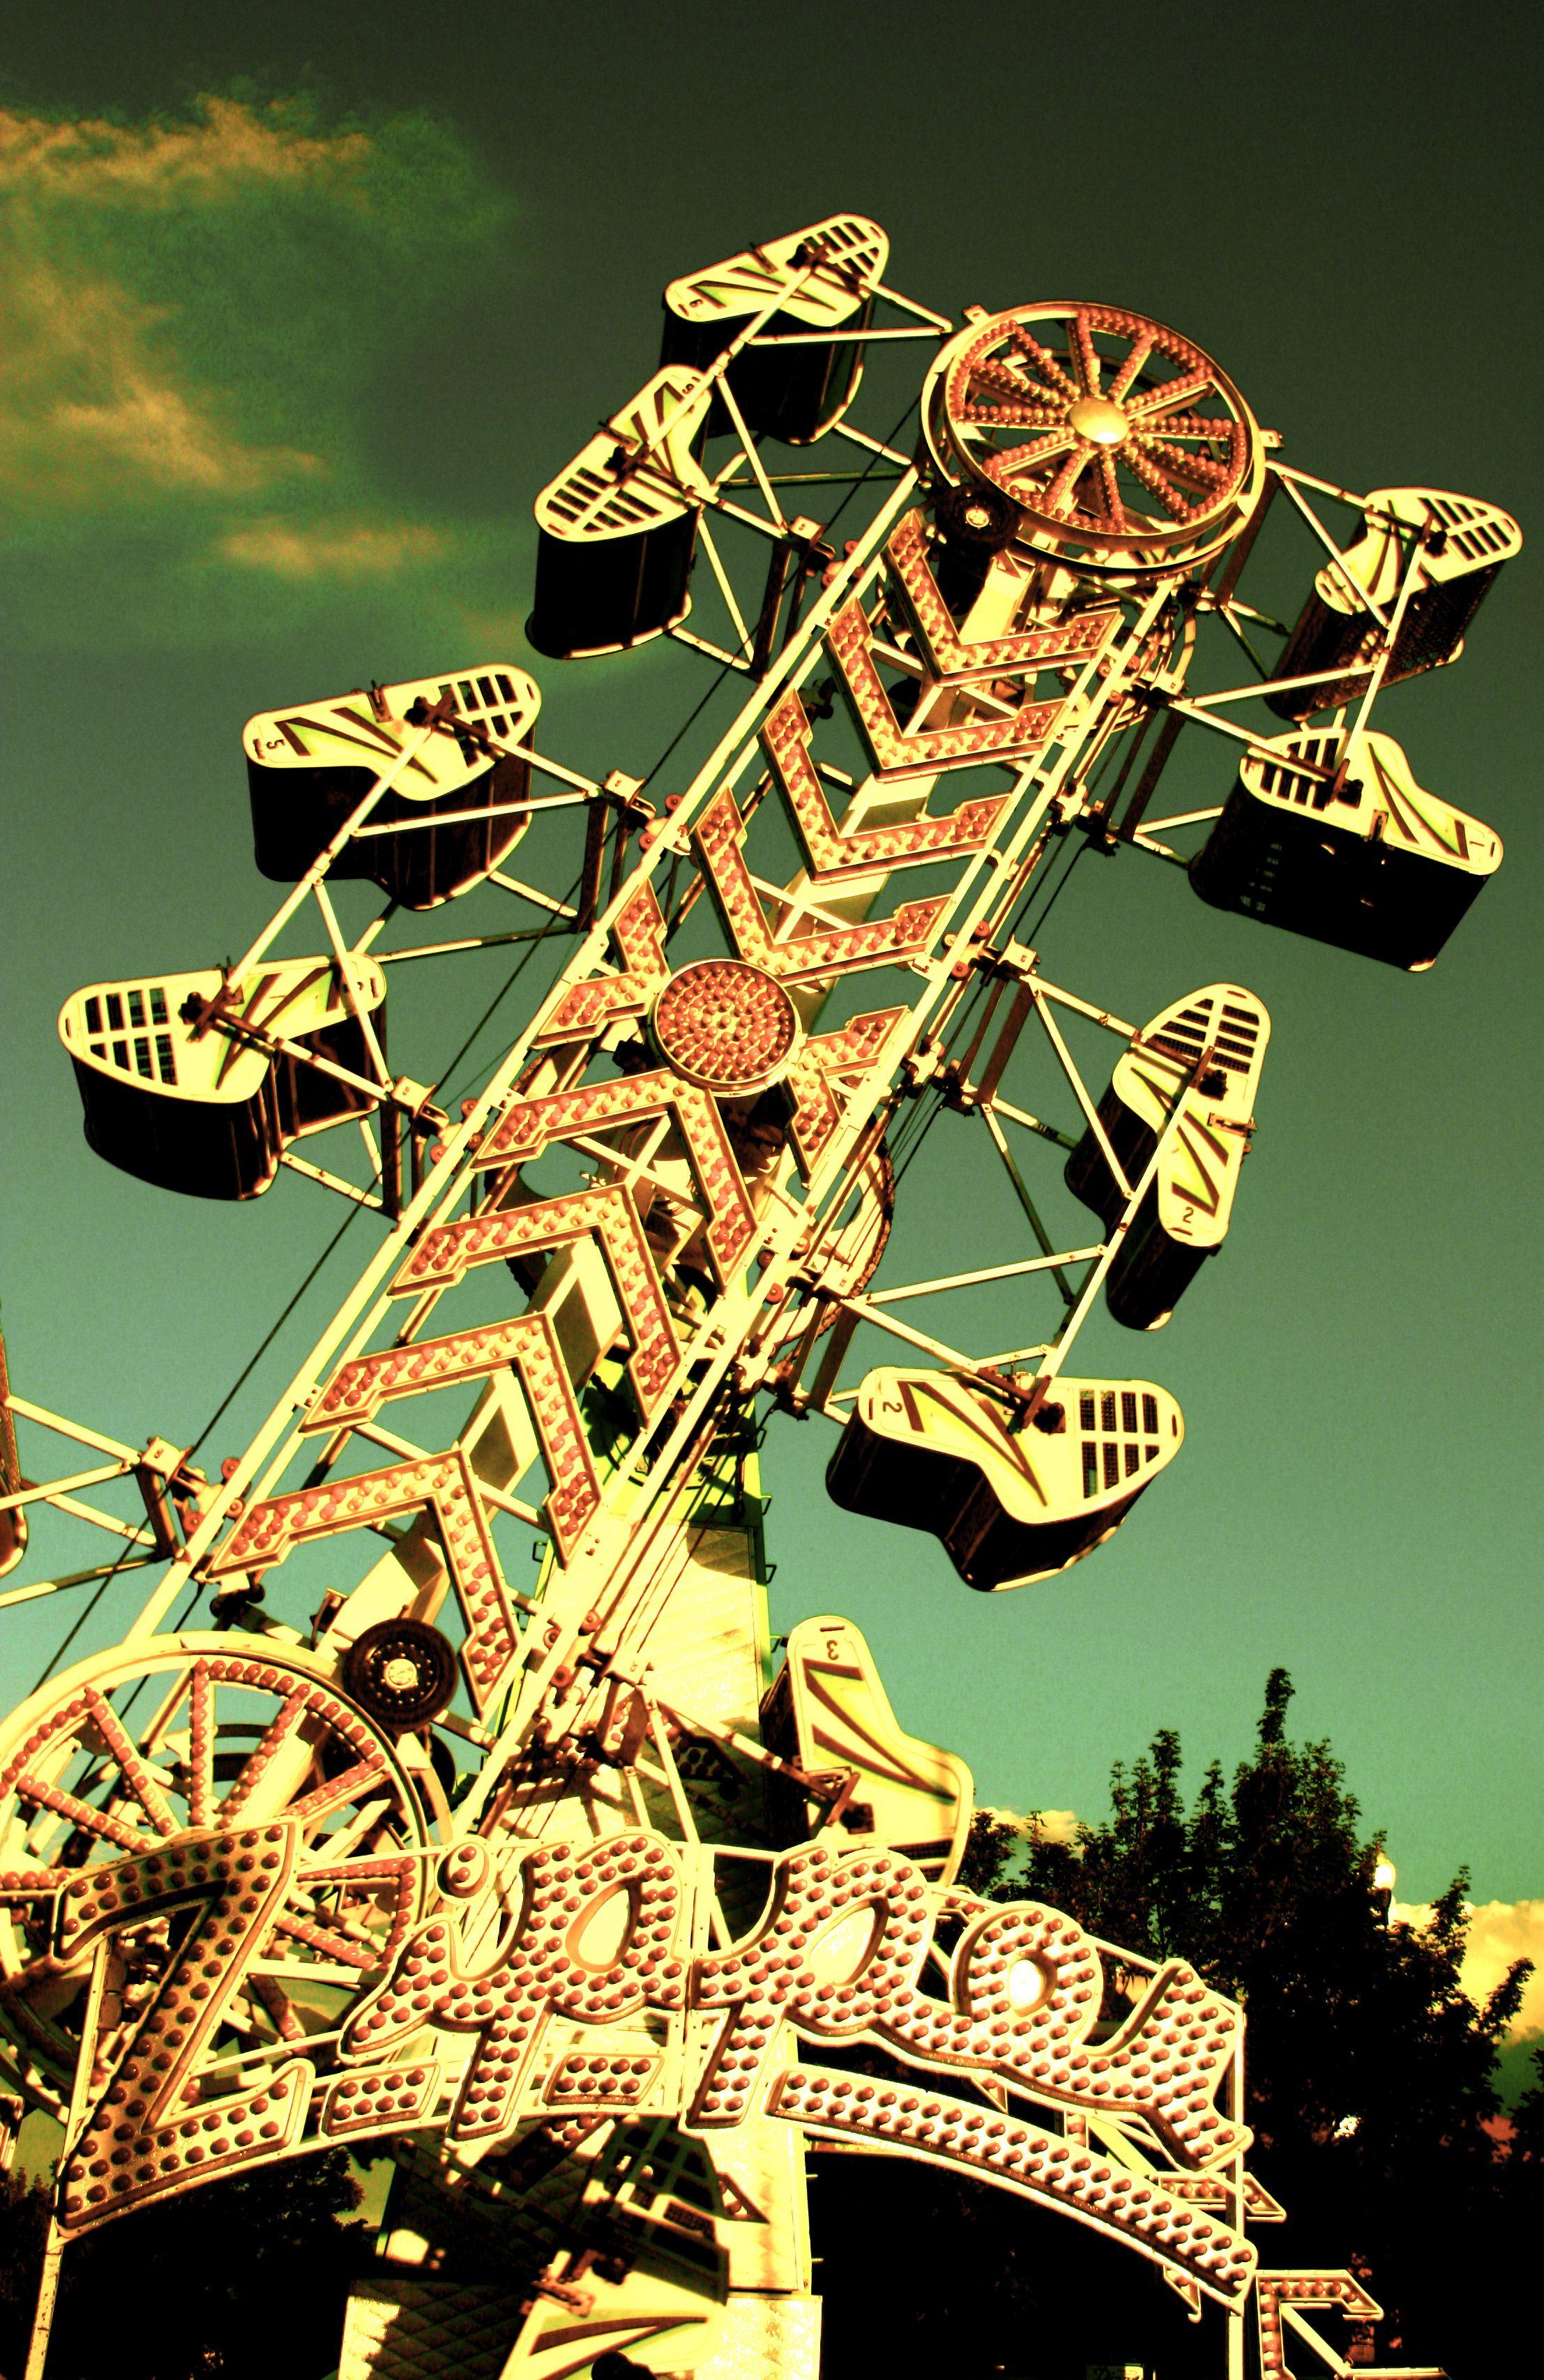 The Zipper carnival ride